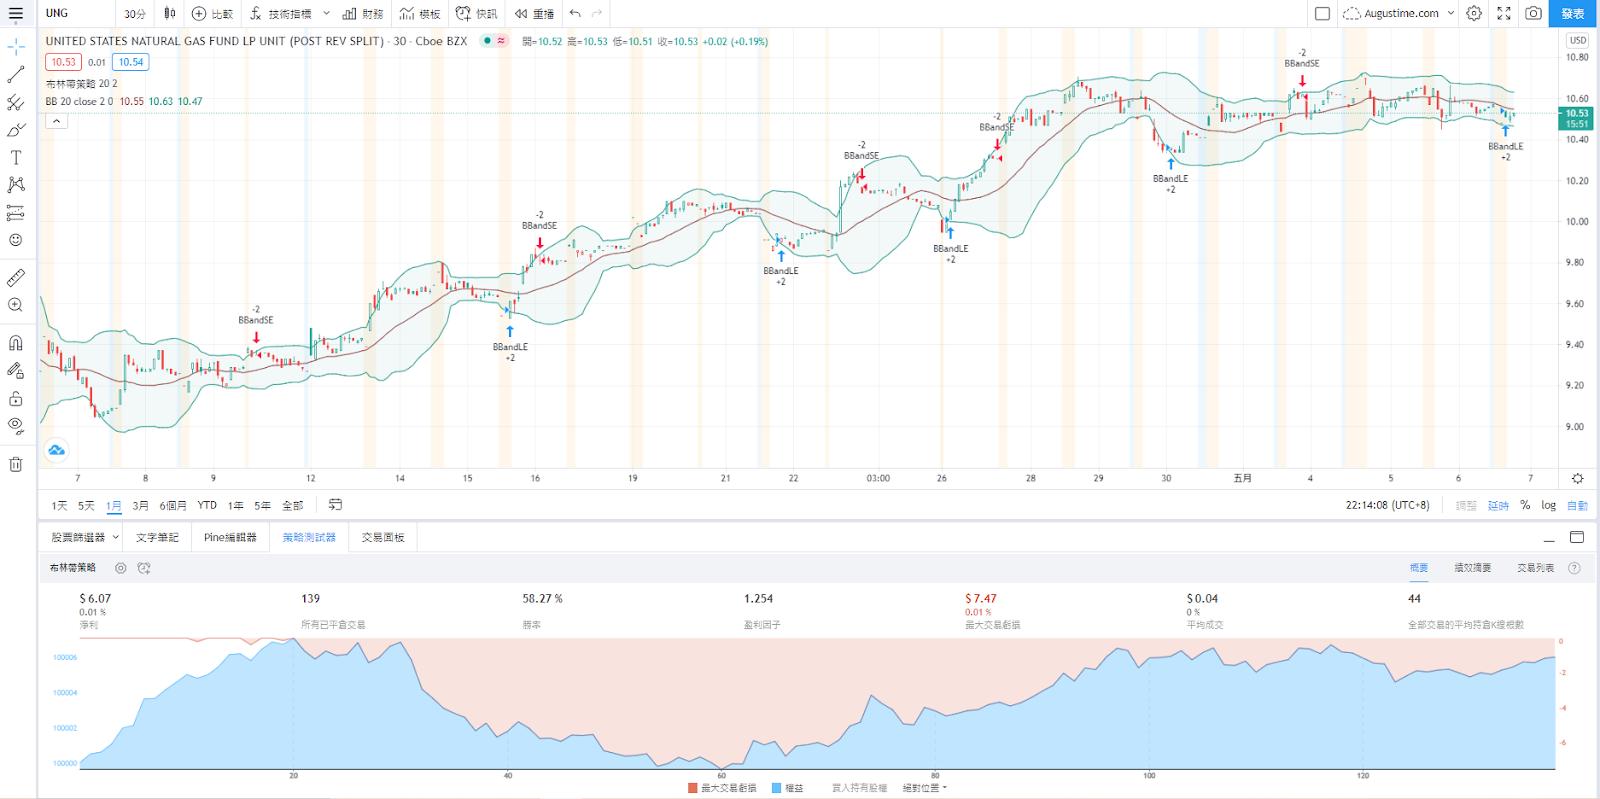 美股UNG,UNG stock,UNG ETF,UNG成分股,UNG持股,UNG股價,UNG配息